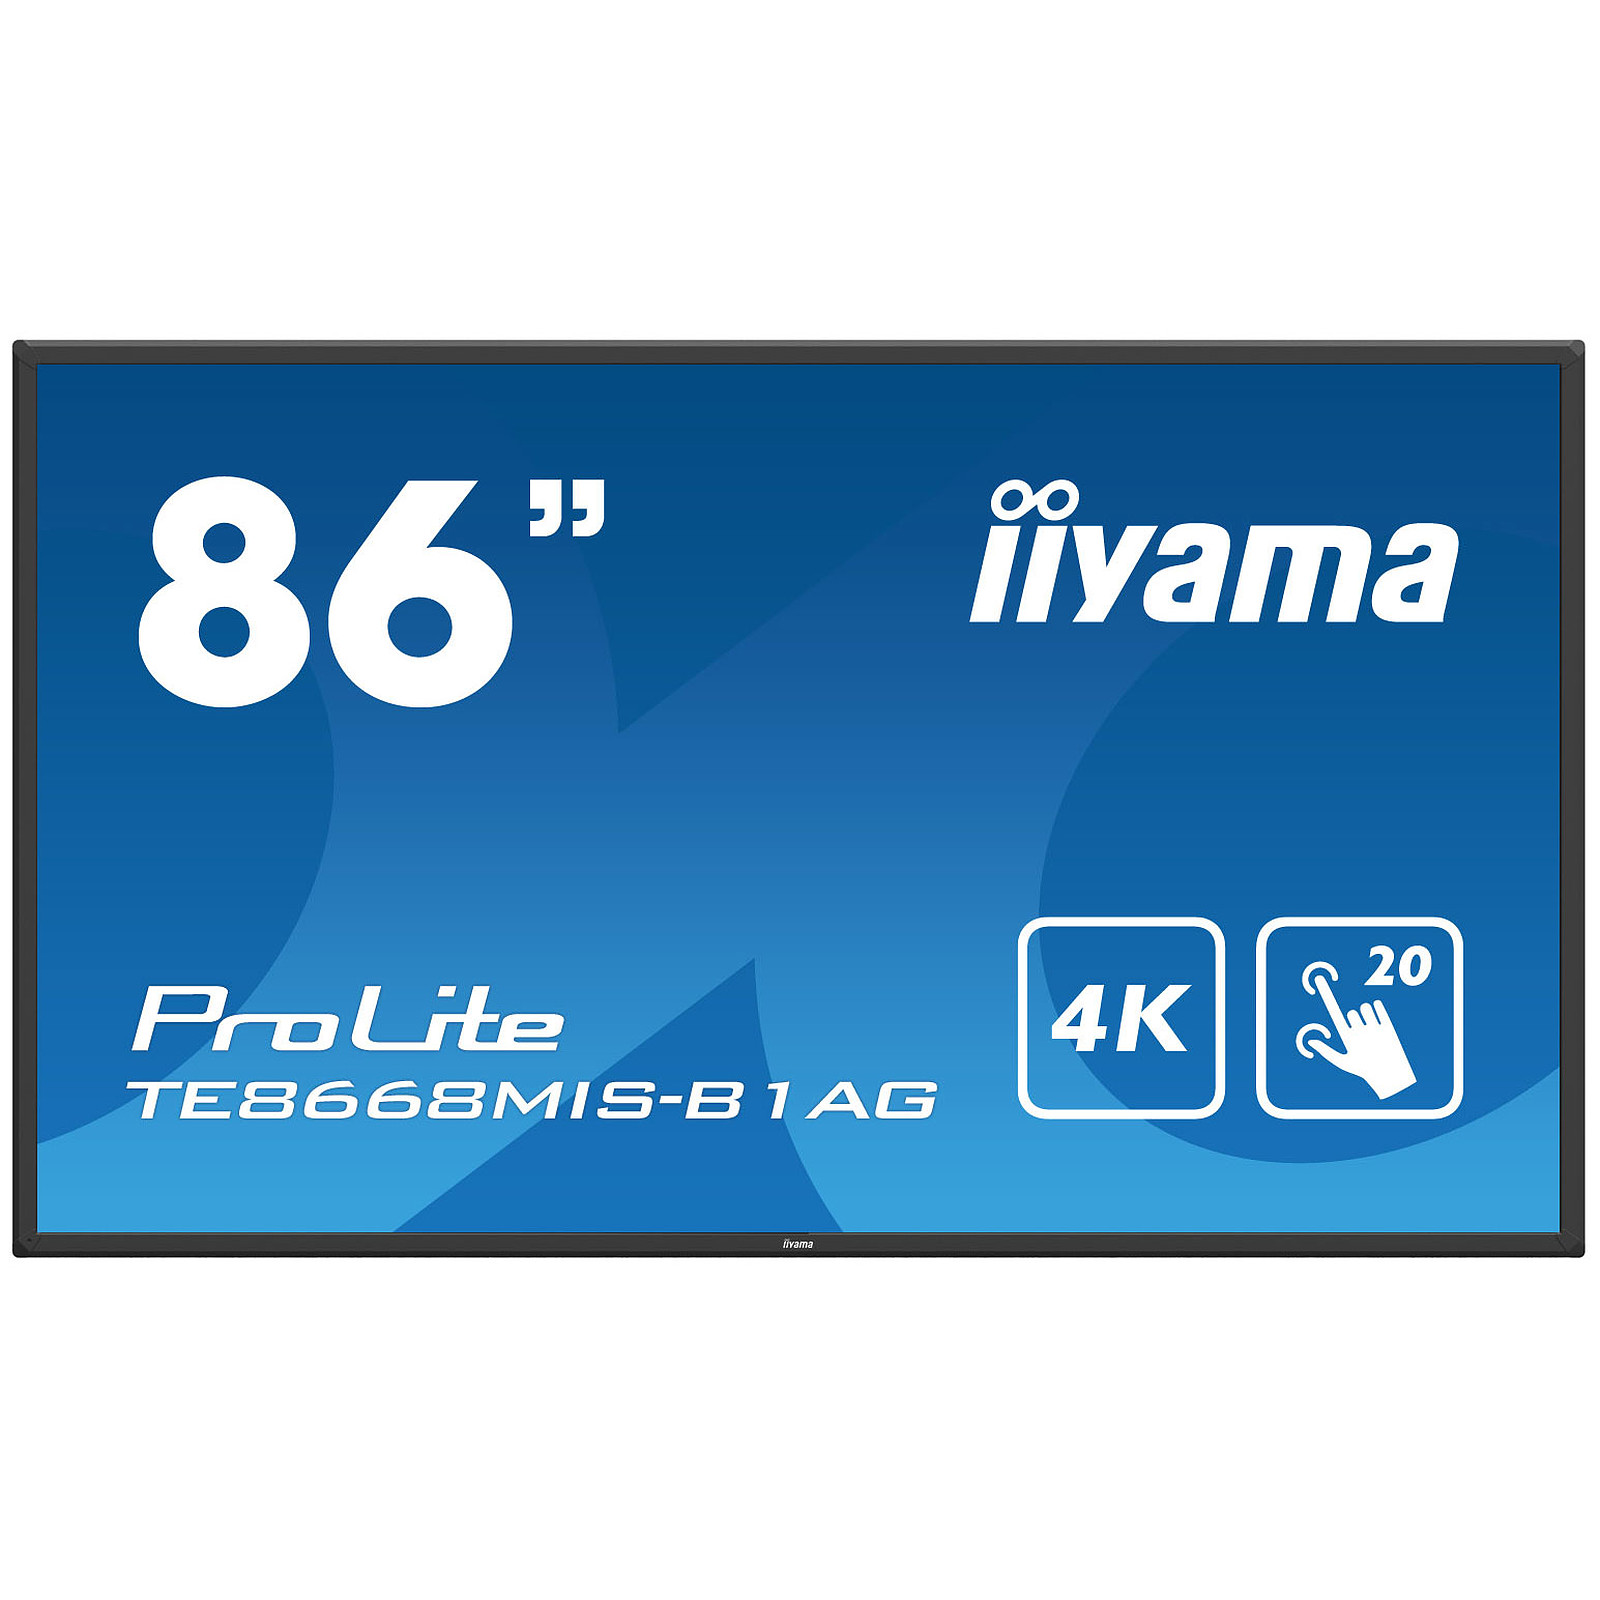 "iiyama 86"" LED - Prolite TE8668MIS-B1AG"